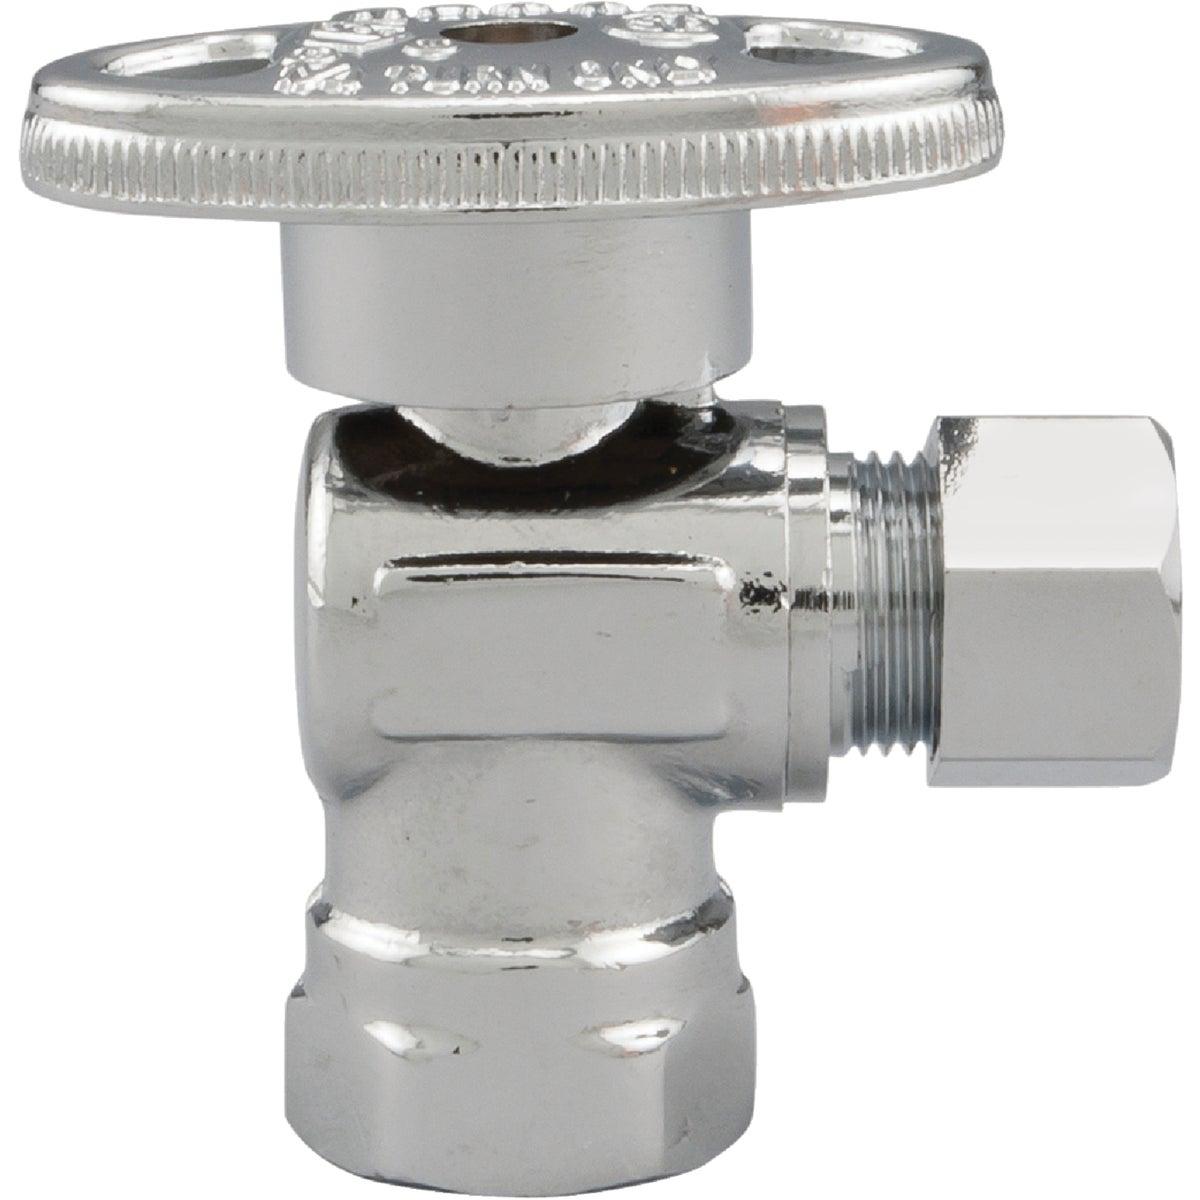 3/8FIPX3/8C ANGLE VALVE - LFPBQT-100 by Watts Regulator Co